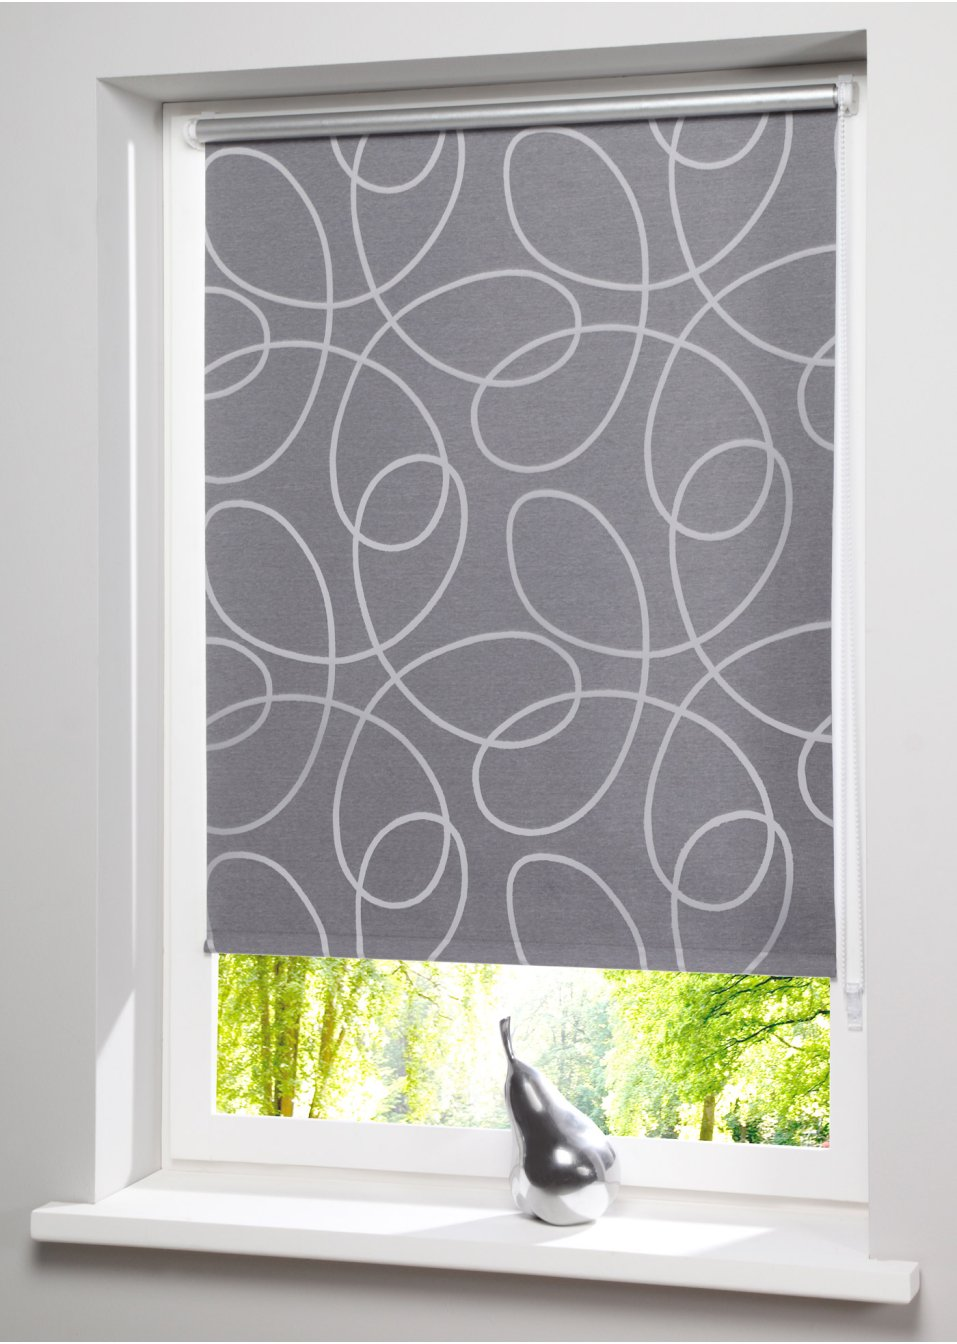 store enrouleur occultant circle fixation clipsable gris. Black Bedroom Furniture Sets. Home Design Ideas